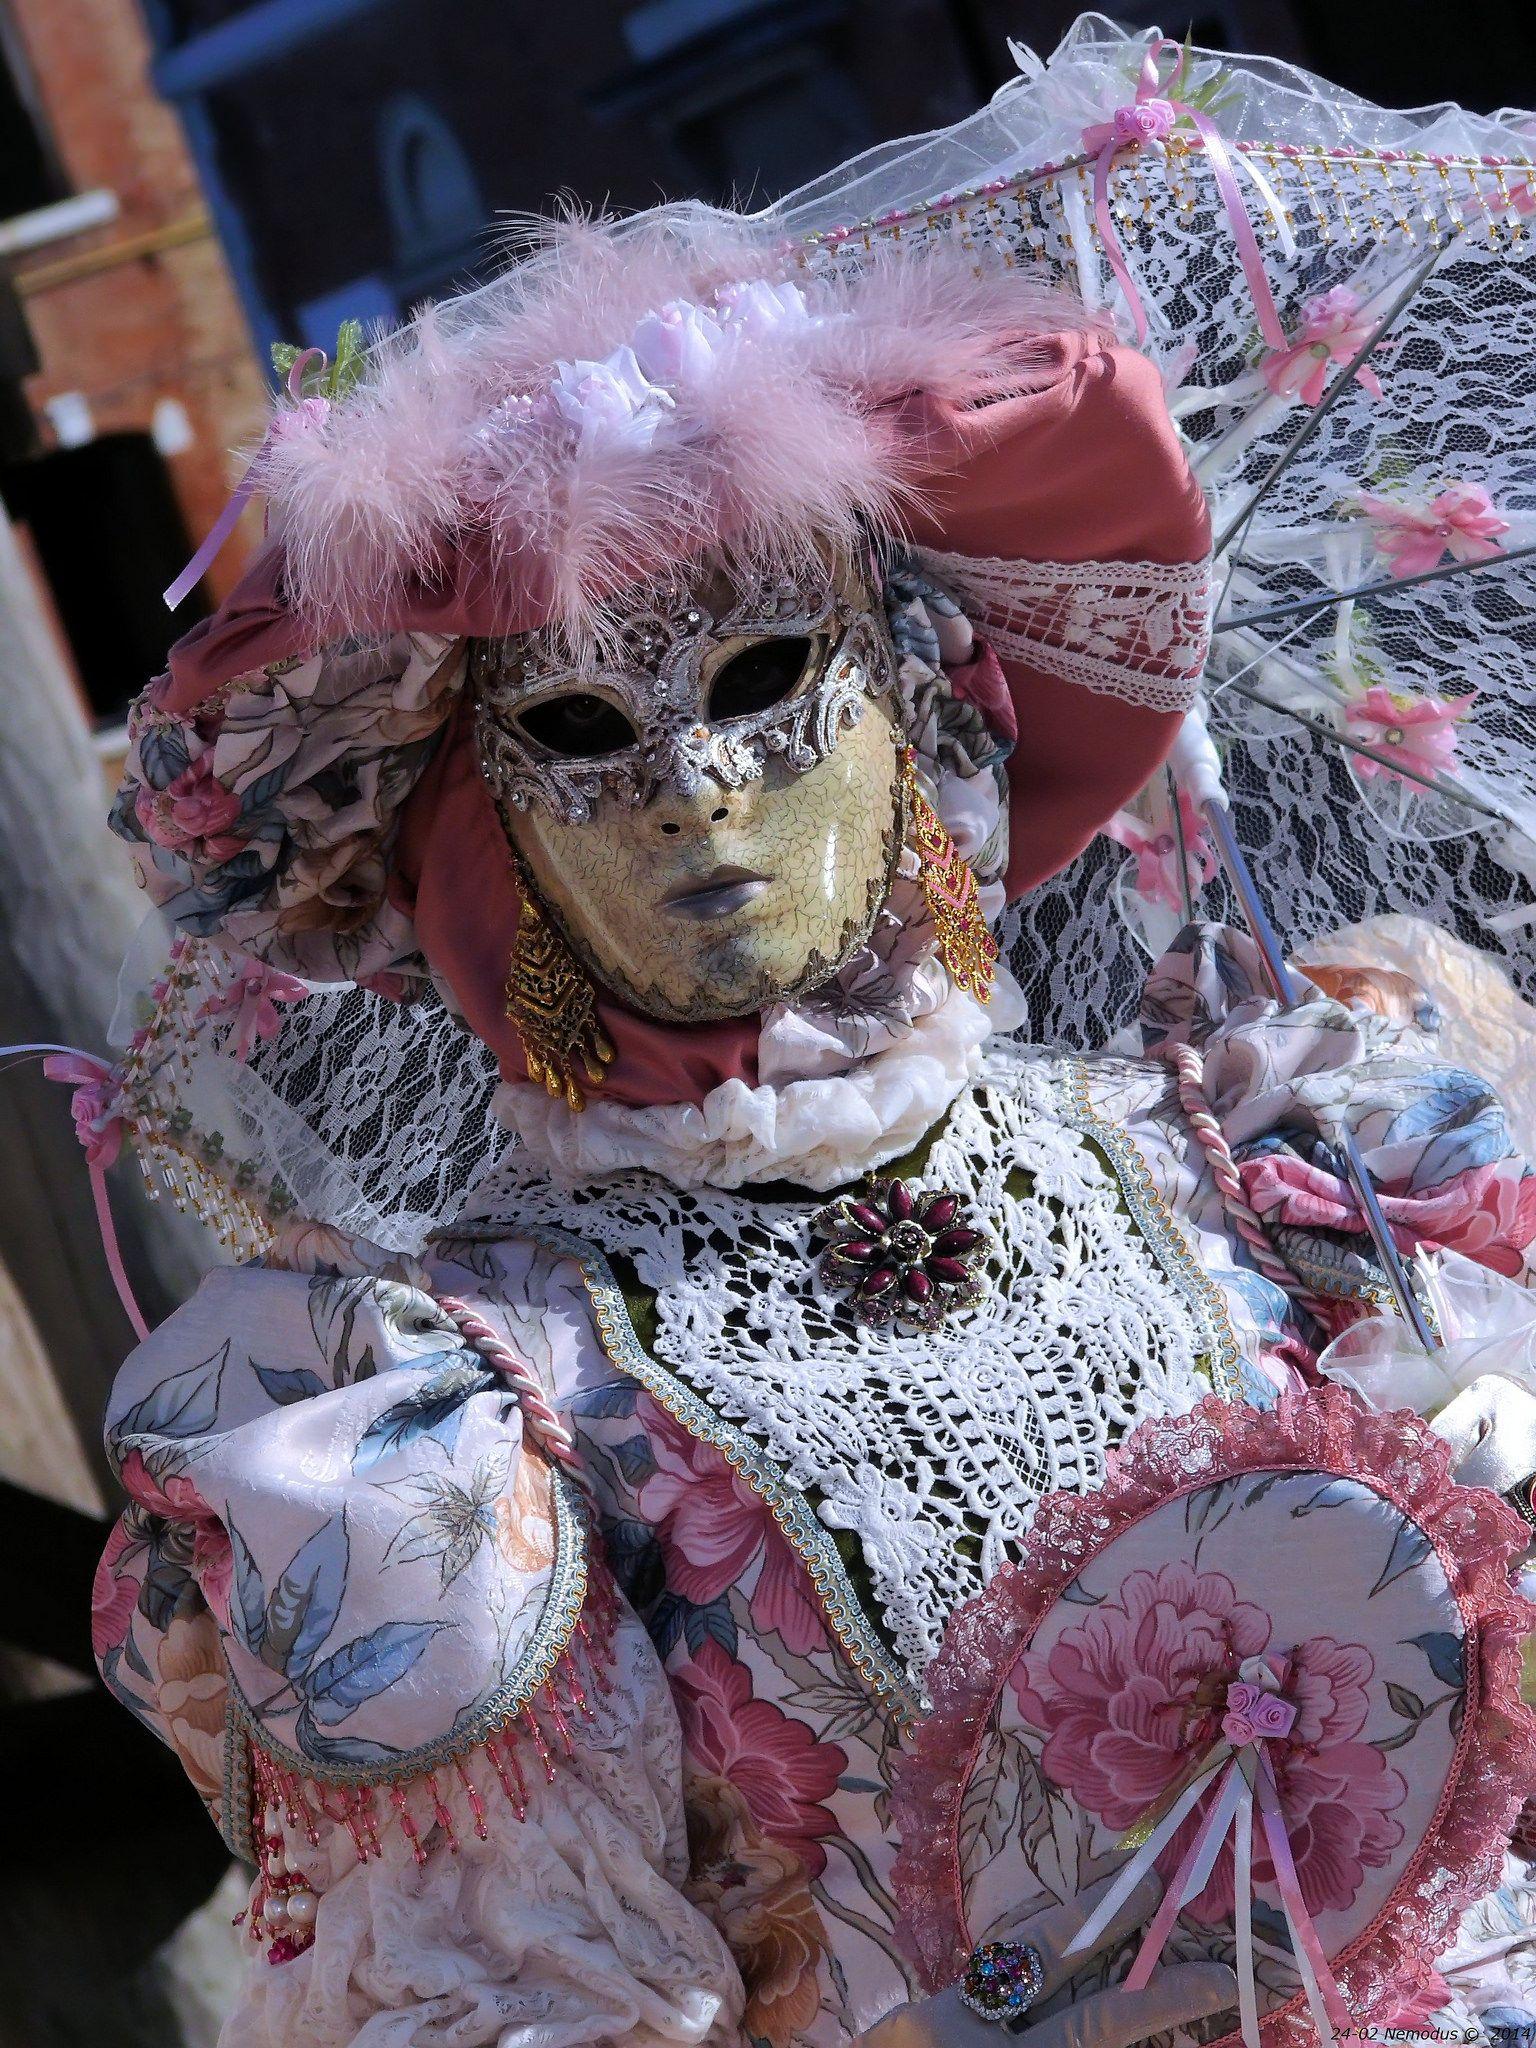 https://flic.kr/p/m4PXTL | Carnival of Venice 2014 - Carnevale di Venezia 2014 - Carnavale de Venise 2014 | Carnival of Venice 2014 - Carnevale di Venezia 2014 - Carnavale de Venise 2014